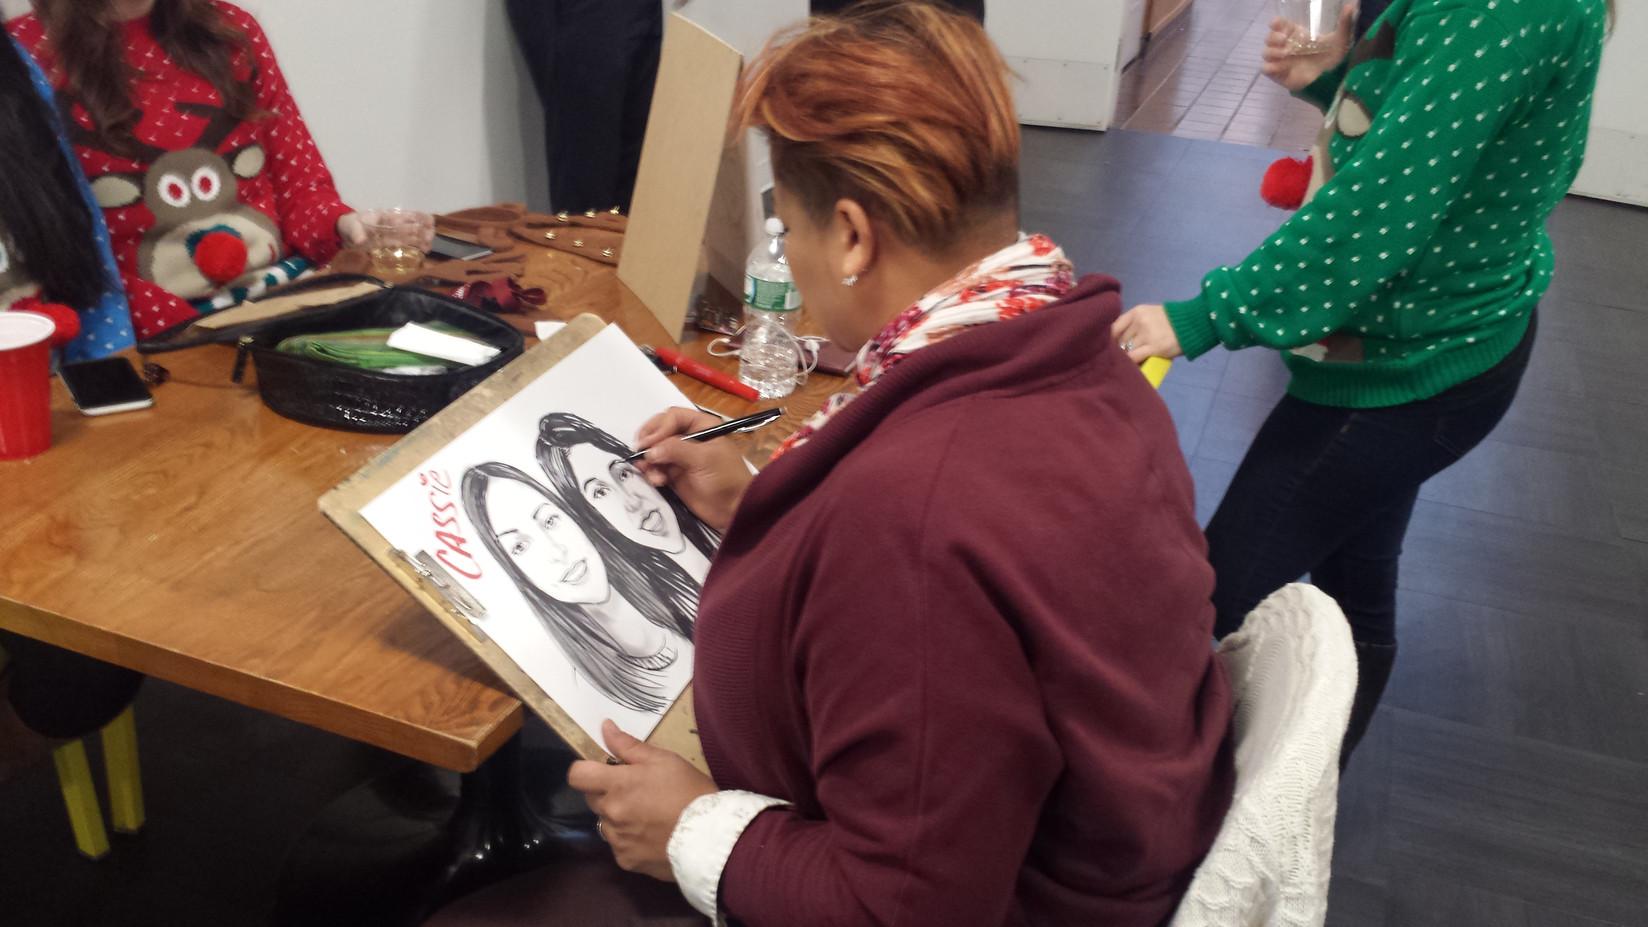 Cartoonist-Draws-Two-Ladies-Working-On-Progress.jpg